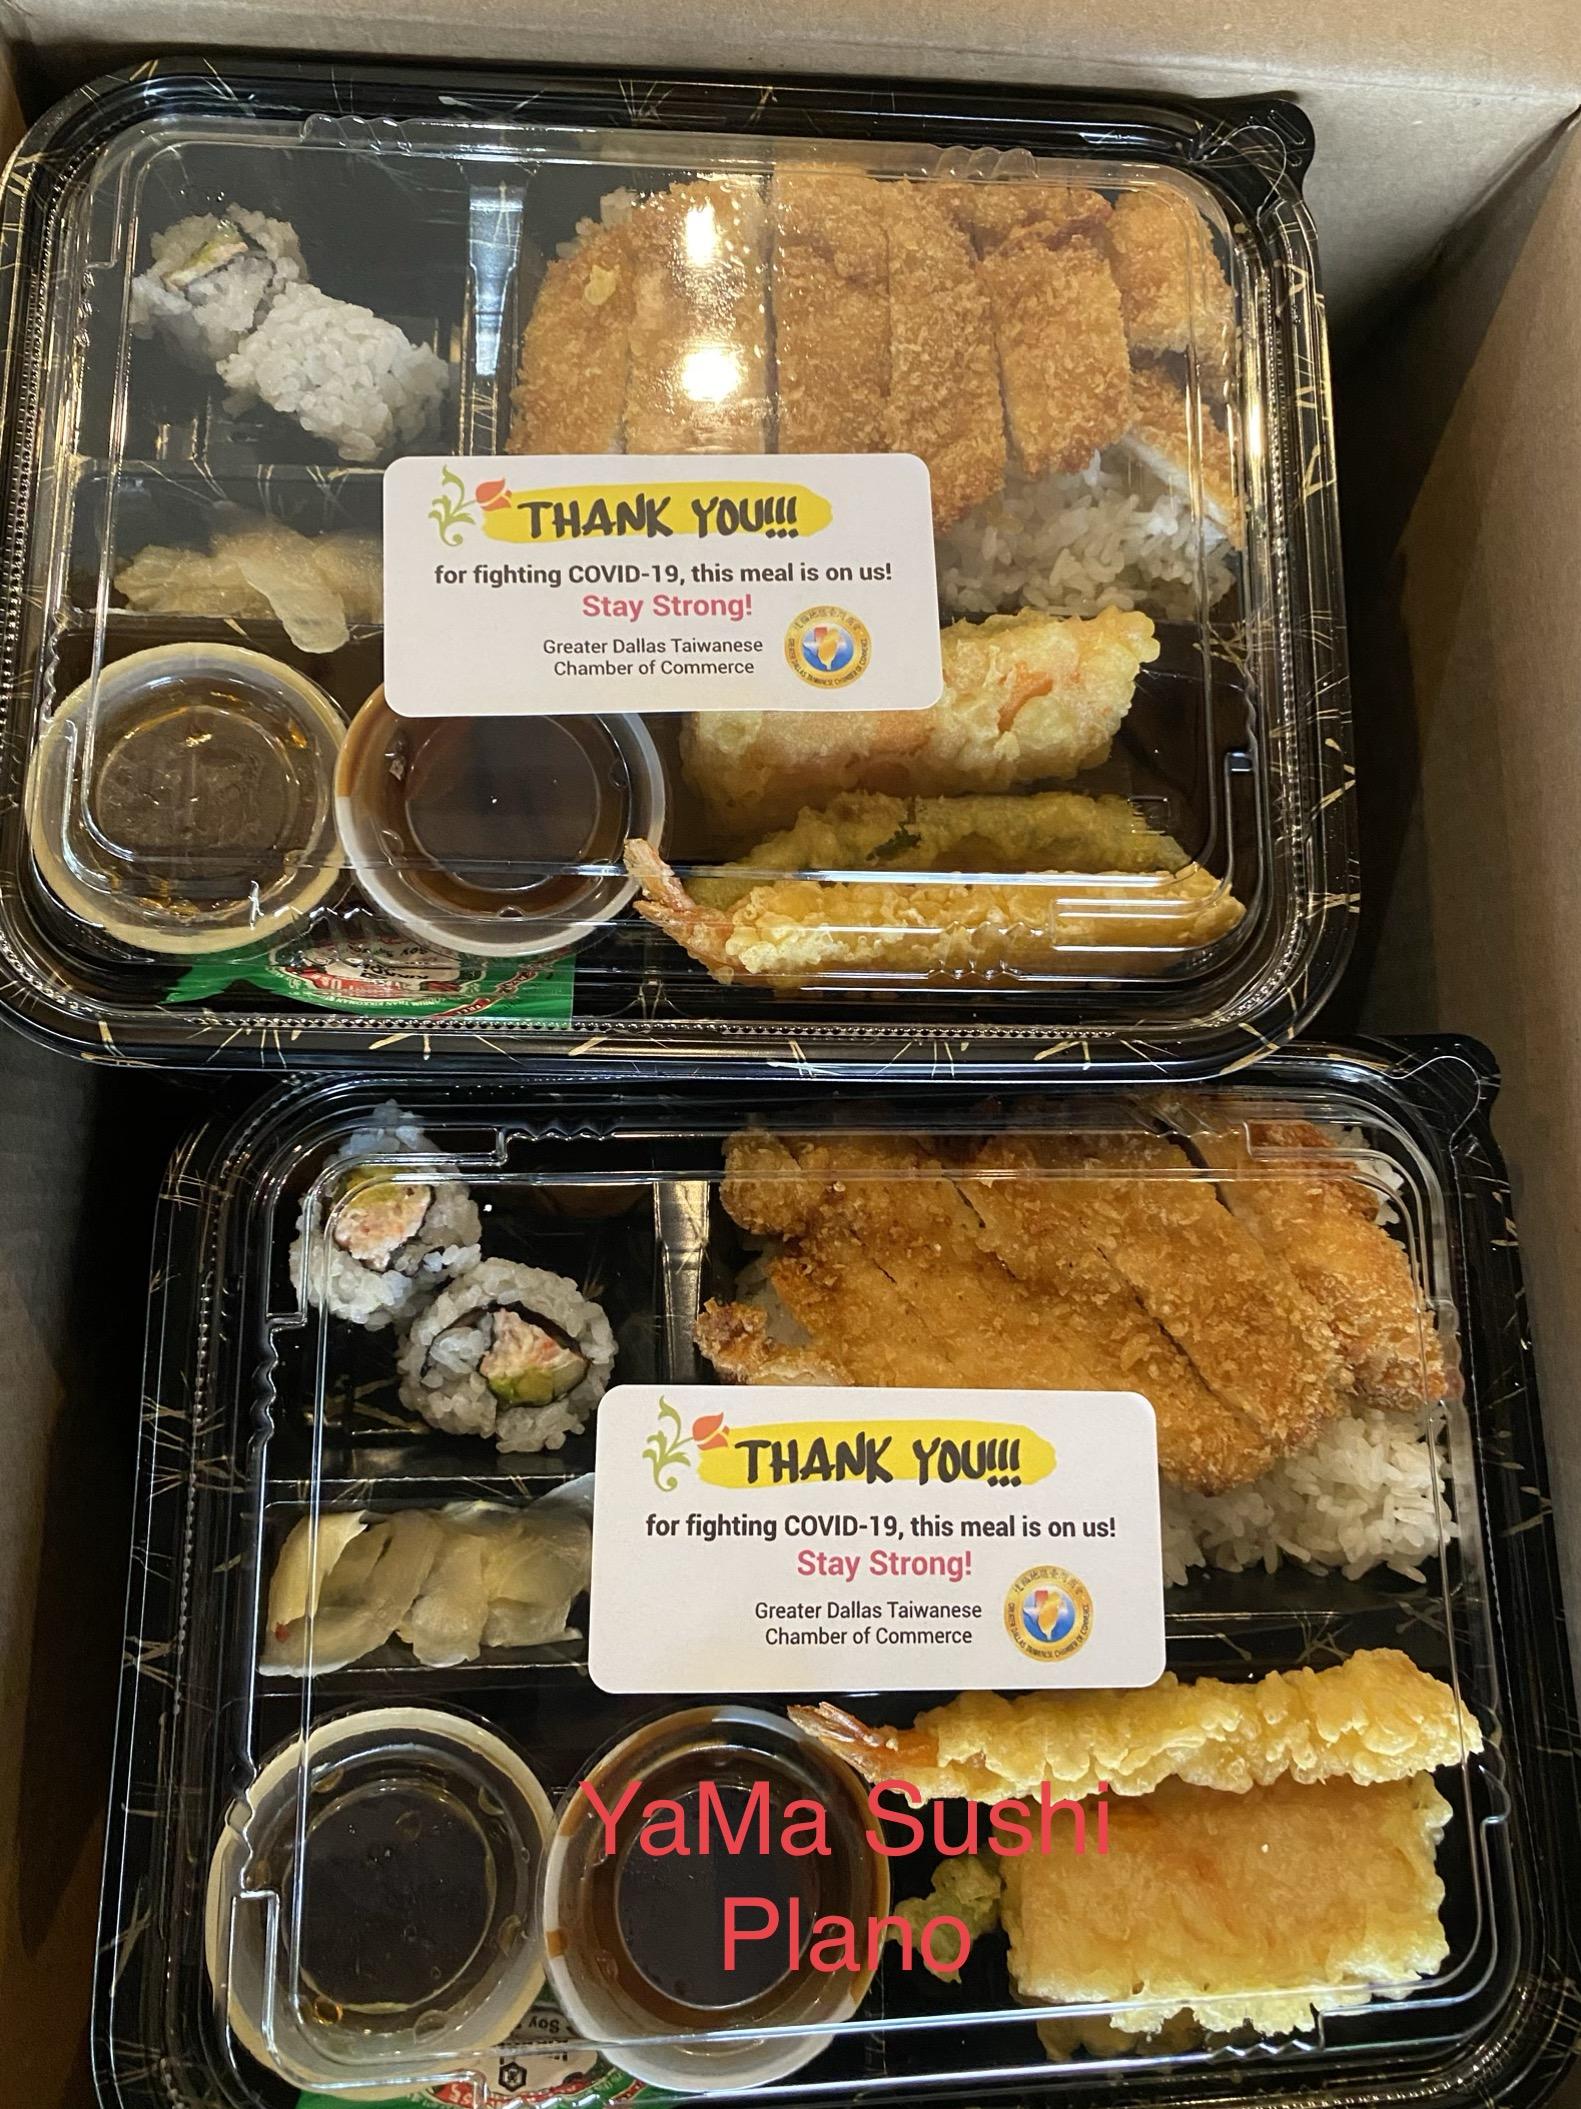 YaMa Sushi Plano提供的美味午餐。